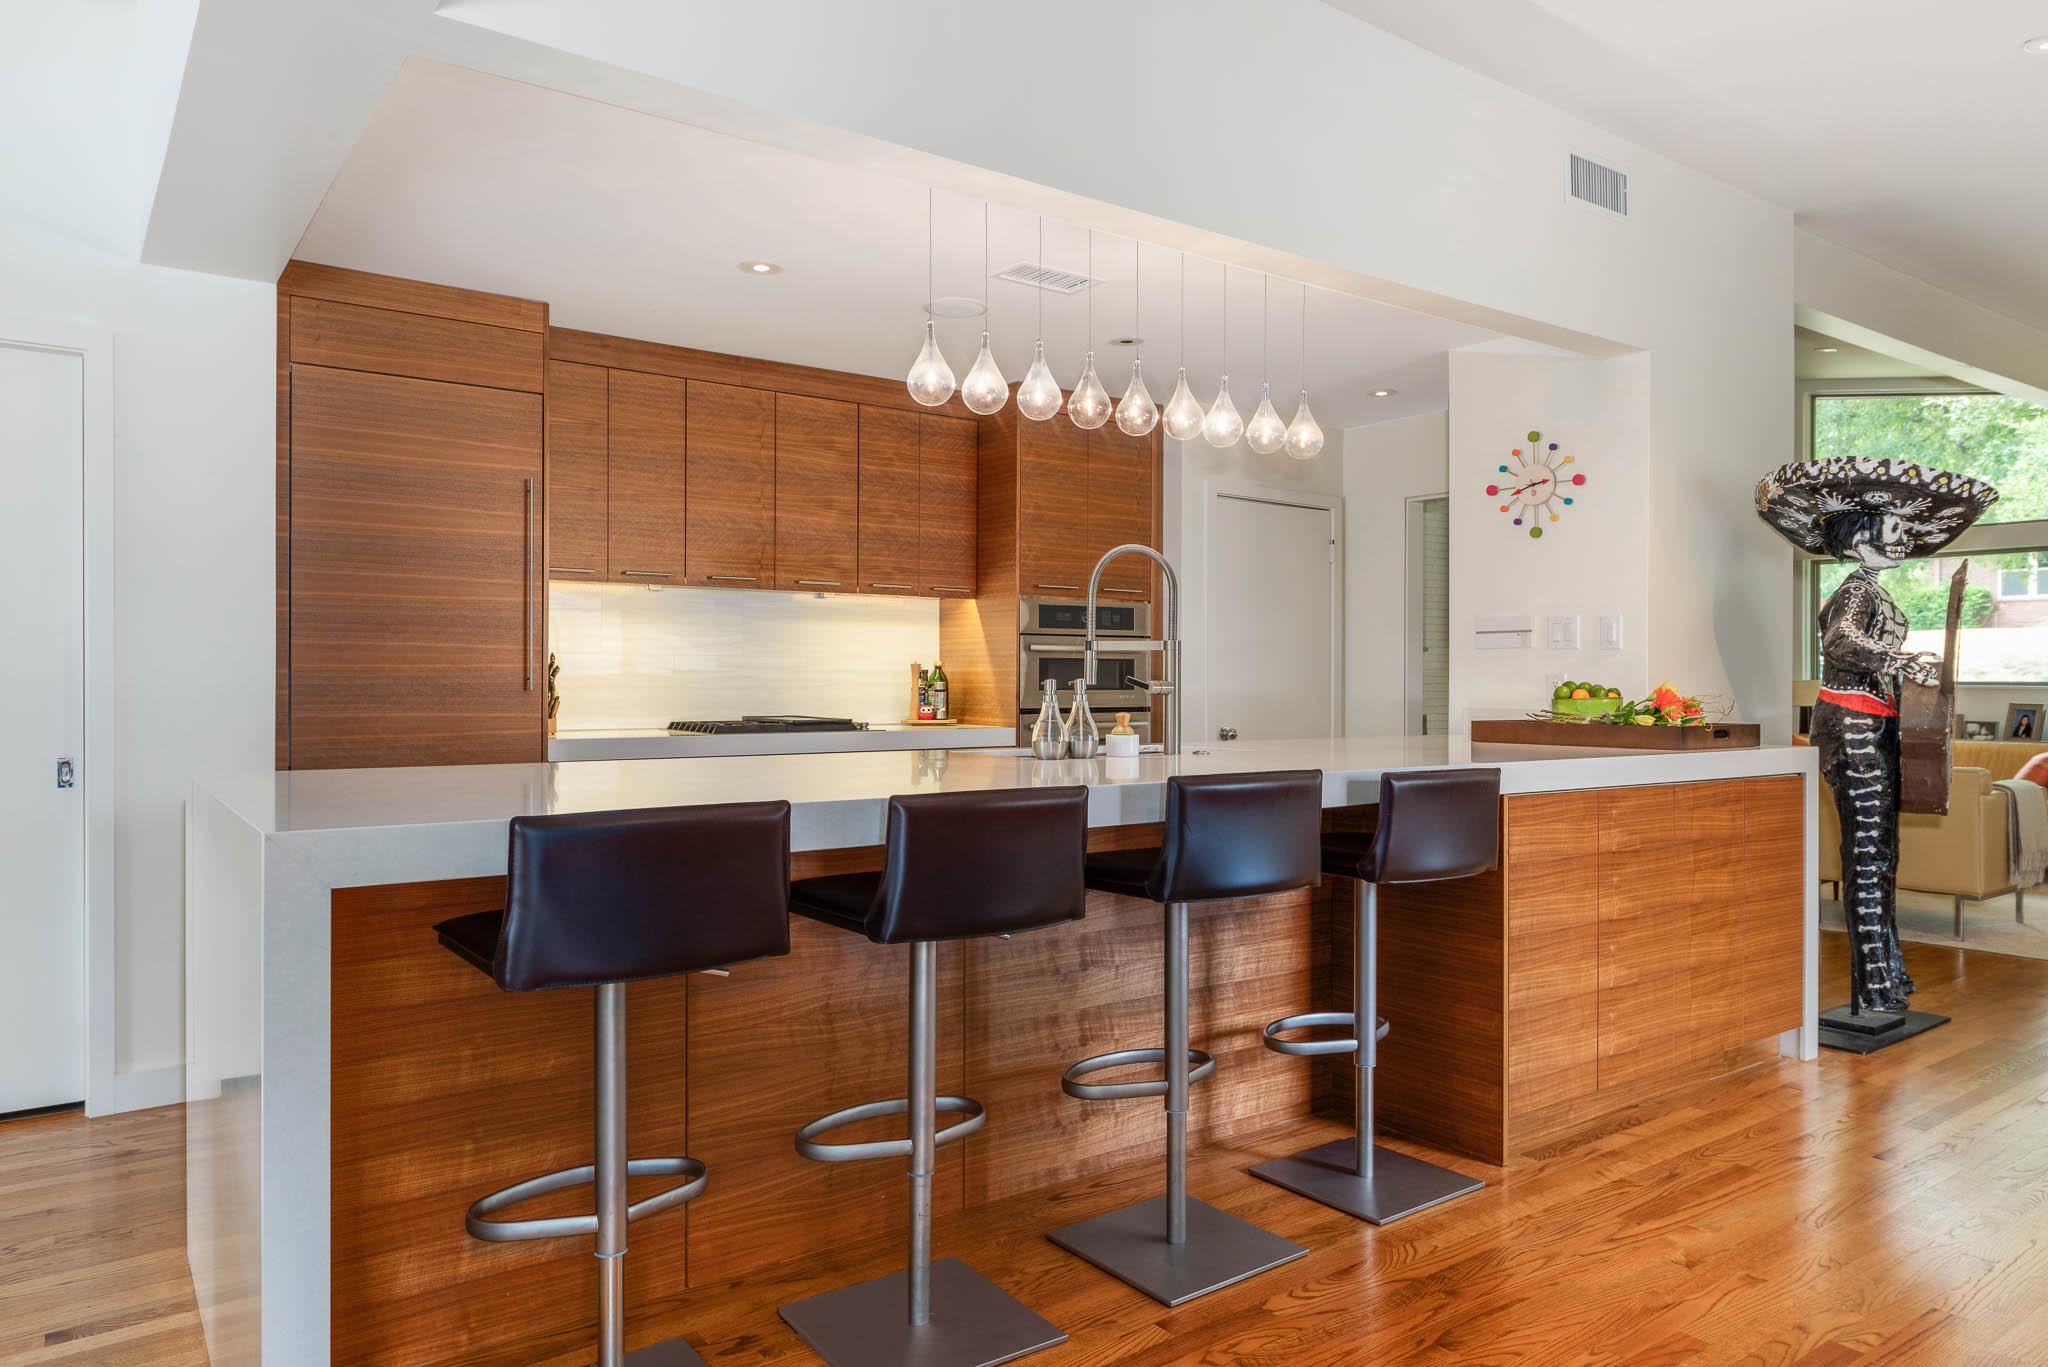 Kitchen in Oak Cliff home